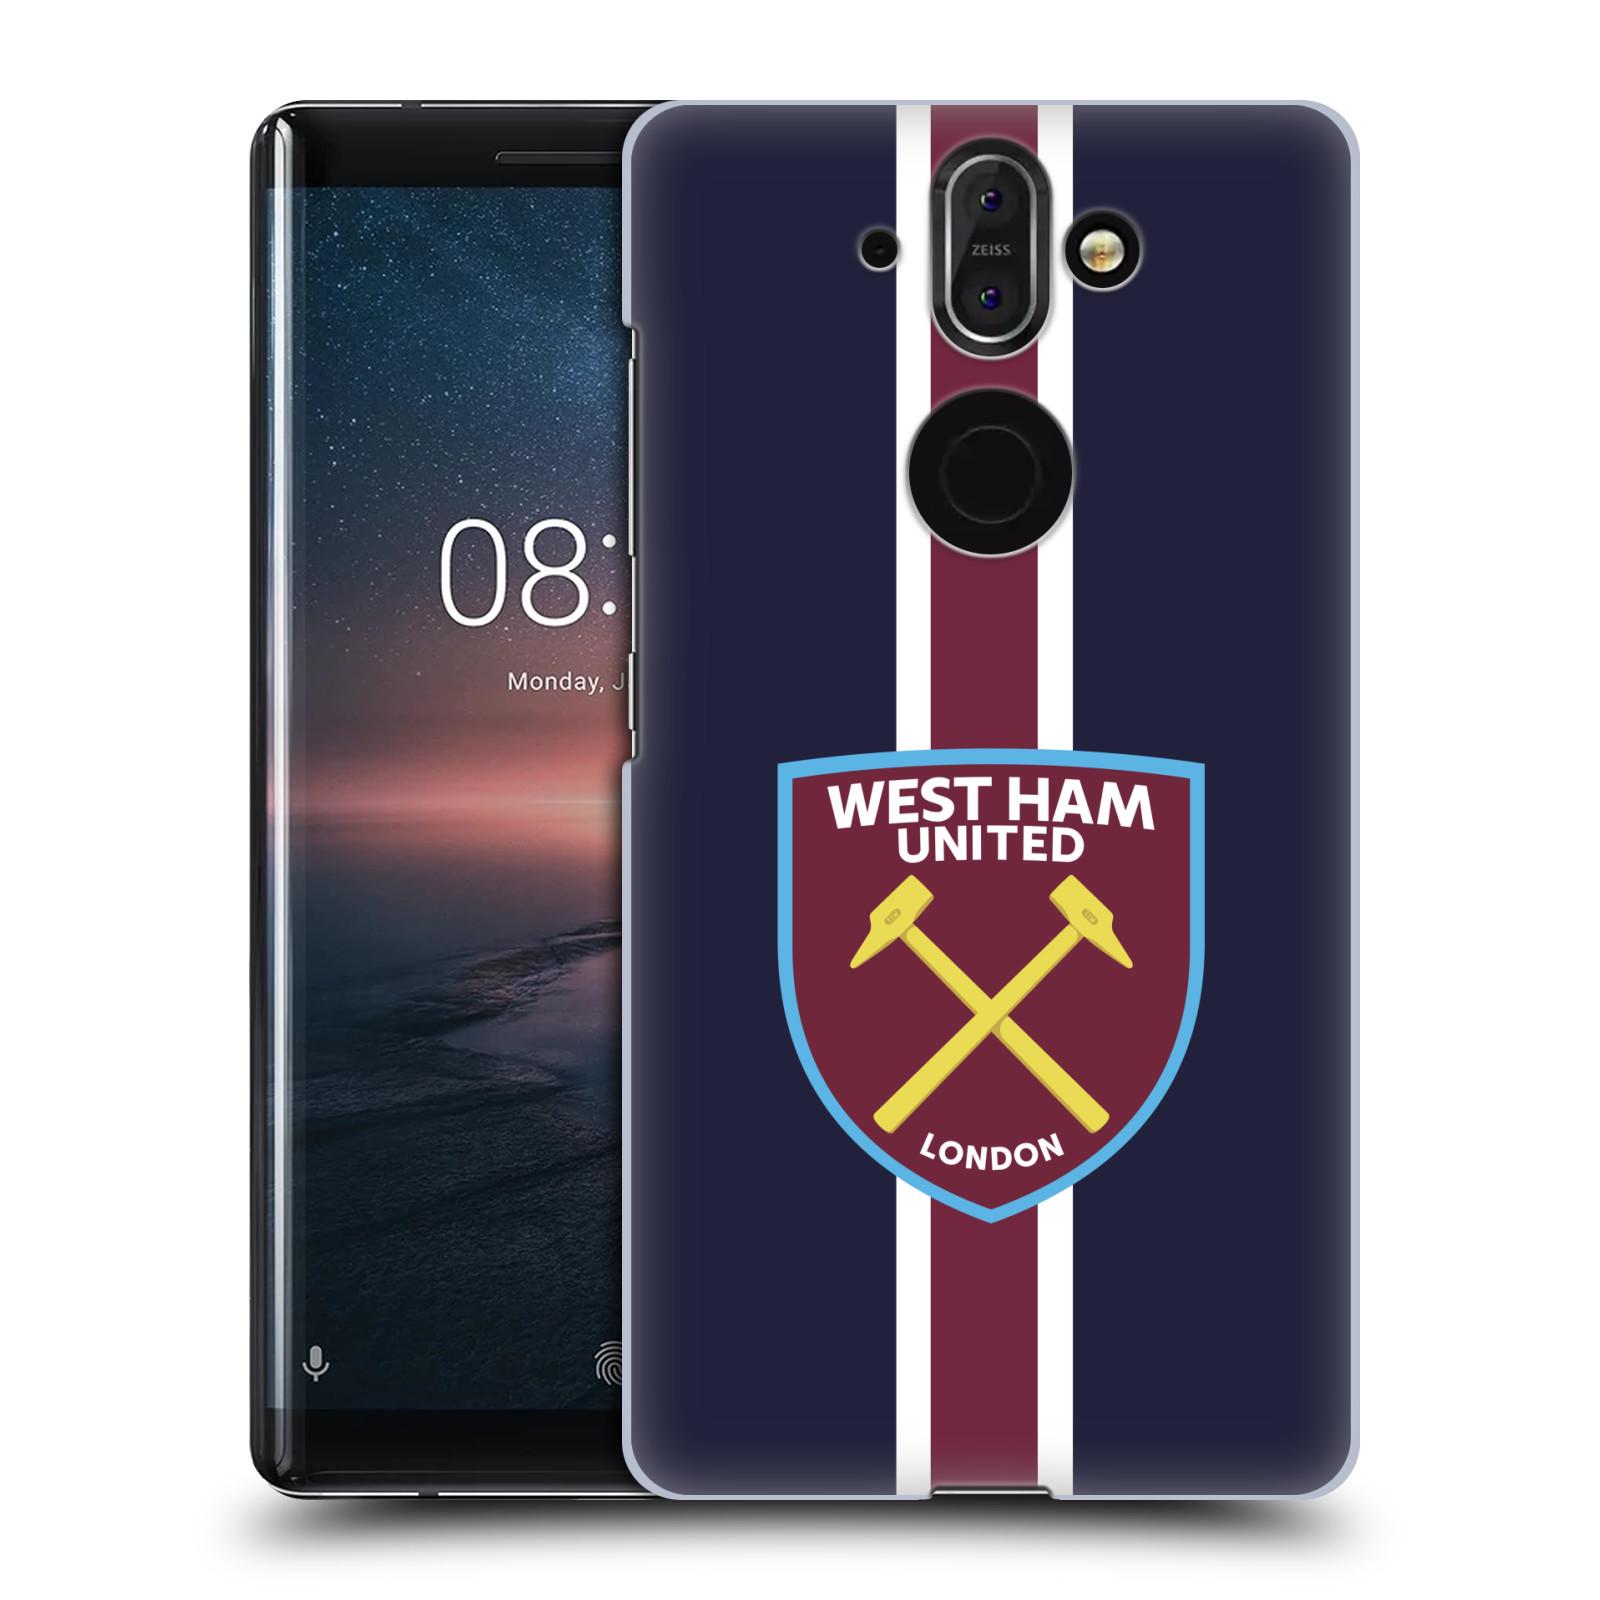 Plastové pouzdro na mobil Nokia 8 Sirocco - Head Case - West Ham United - Pruhy